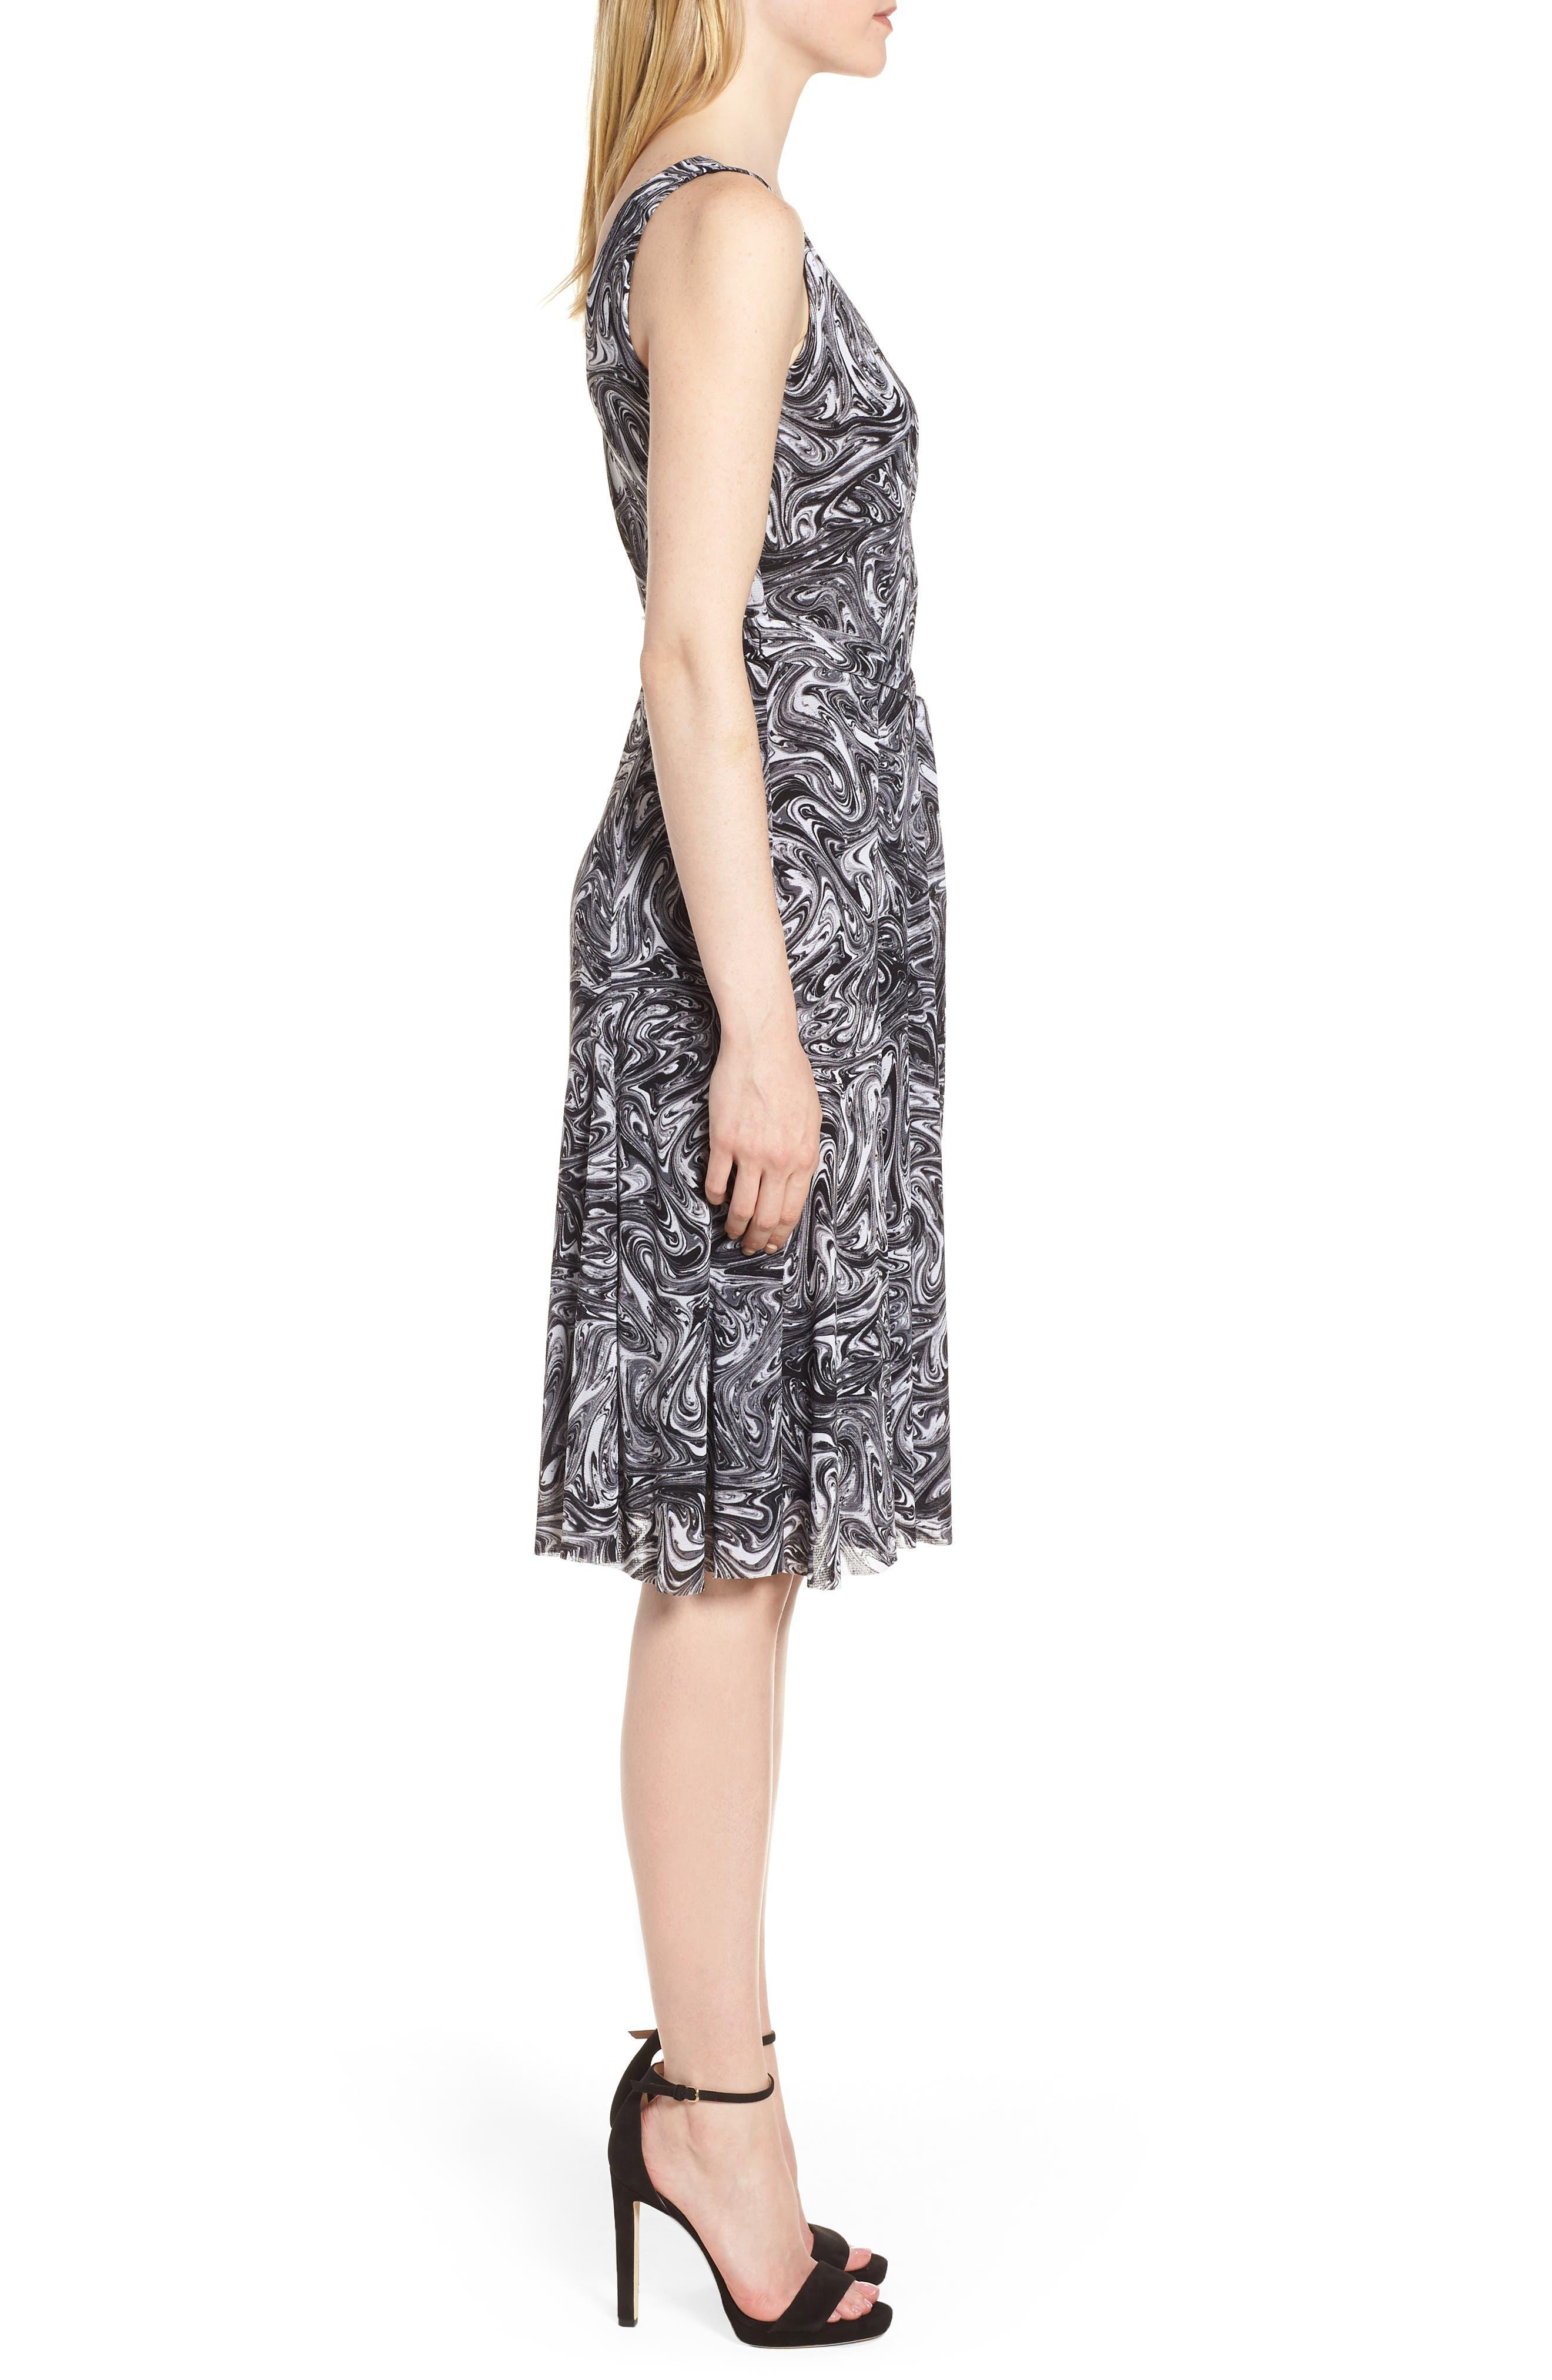 Watermark Swirl Flare Tank Dress,                             Alternate thumbnail 3, color,                             001